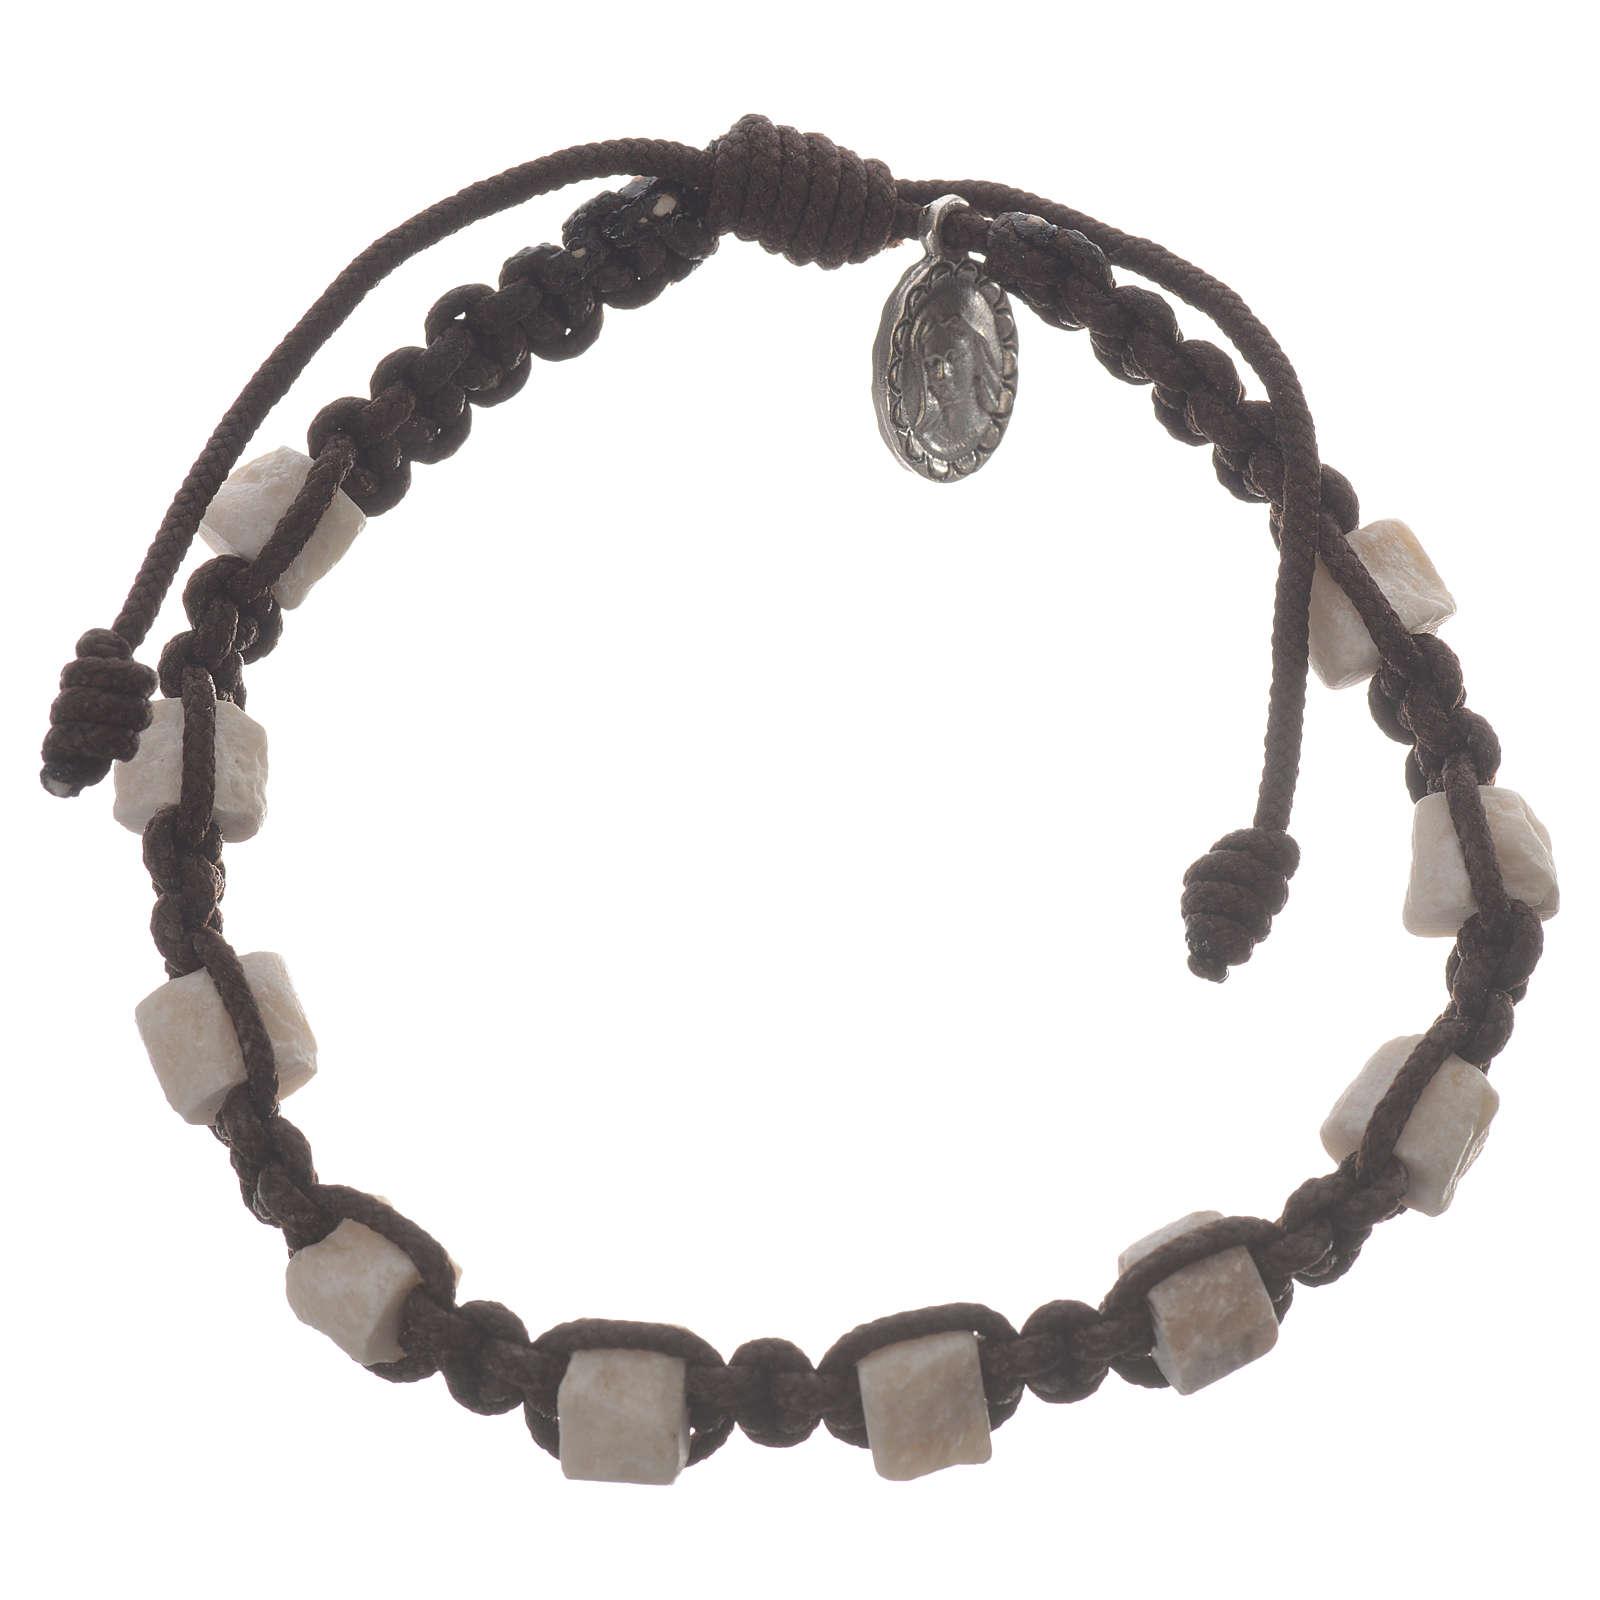 Bracelet dizainier Medjugorje marron et pierre 4